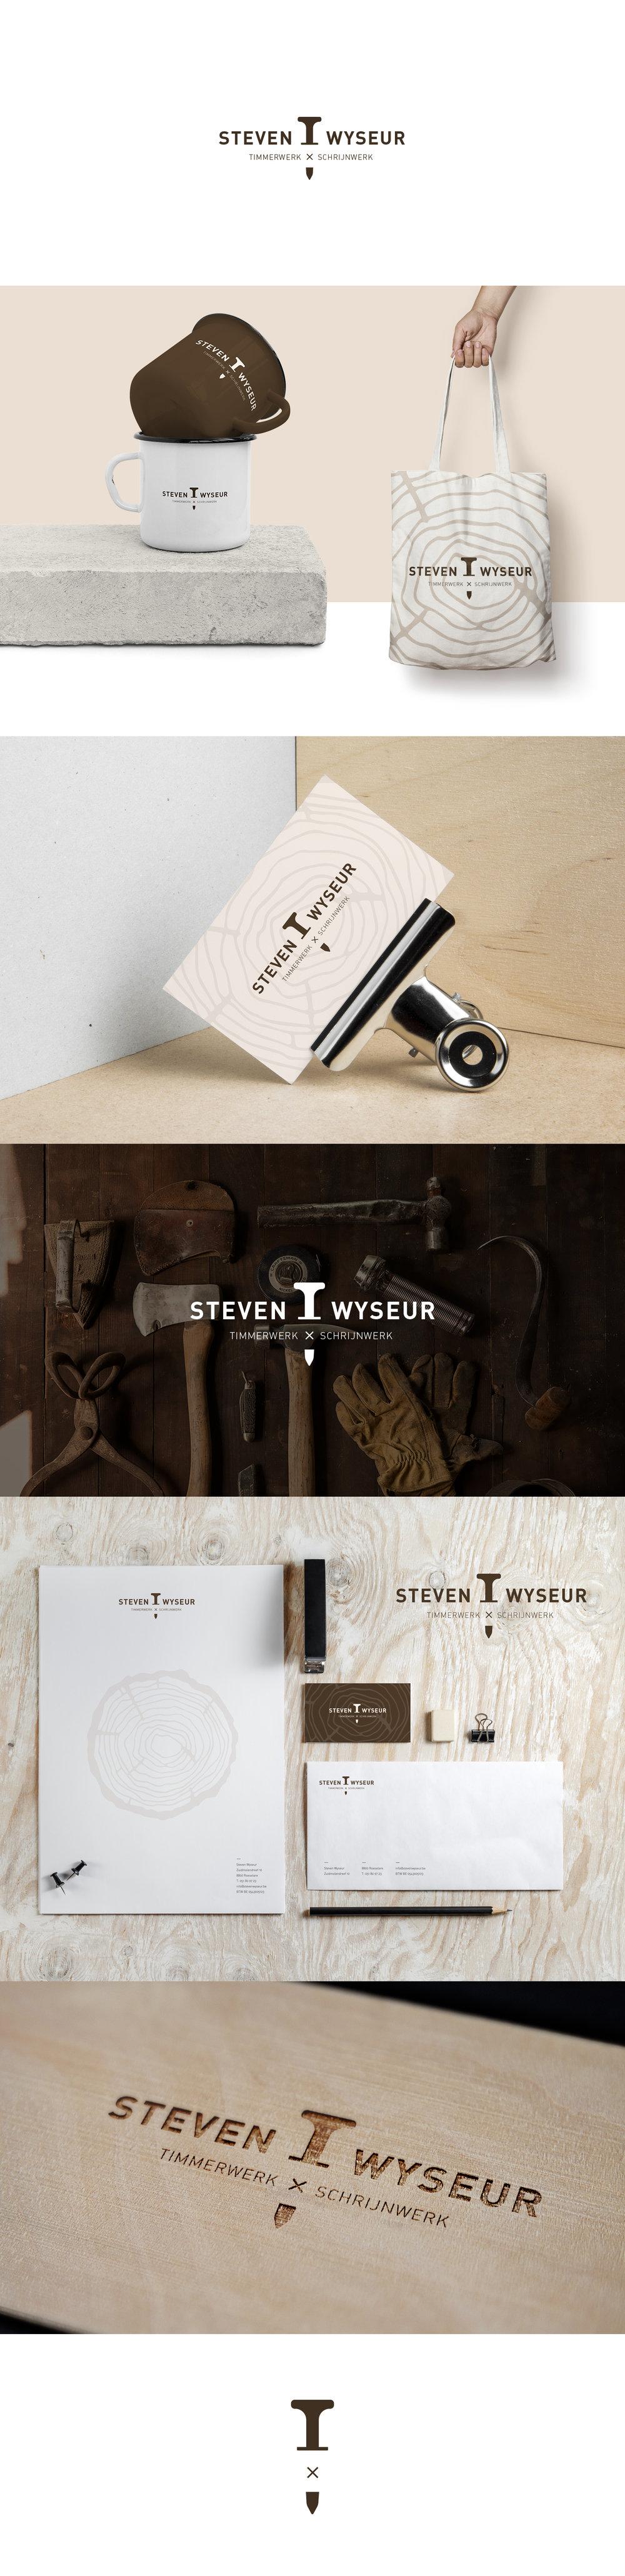 Steven Wyseur